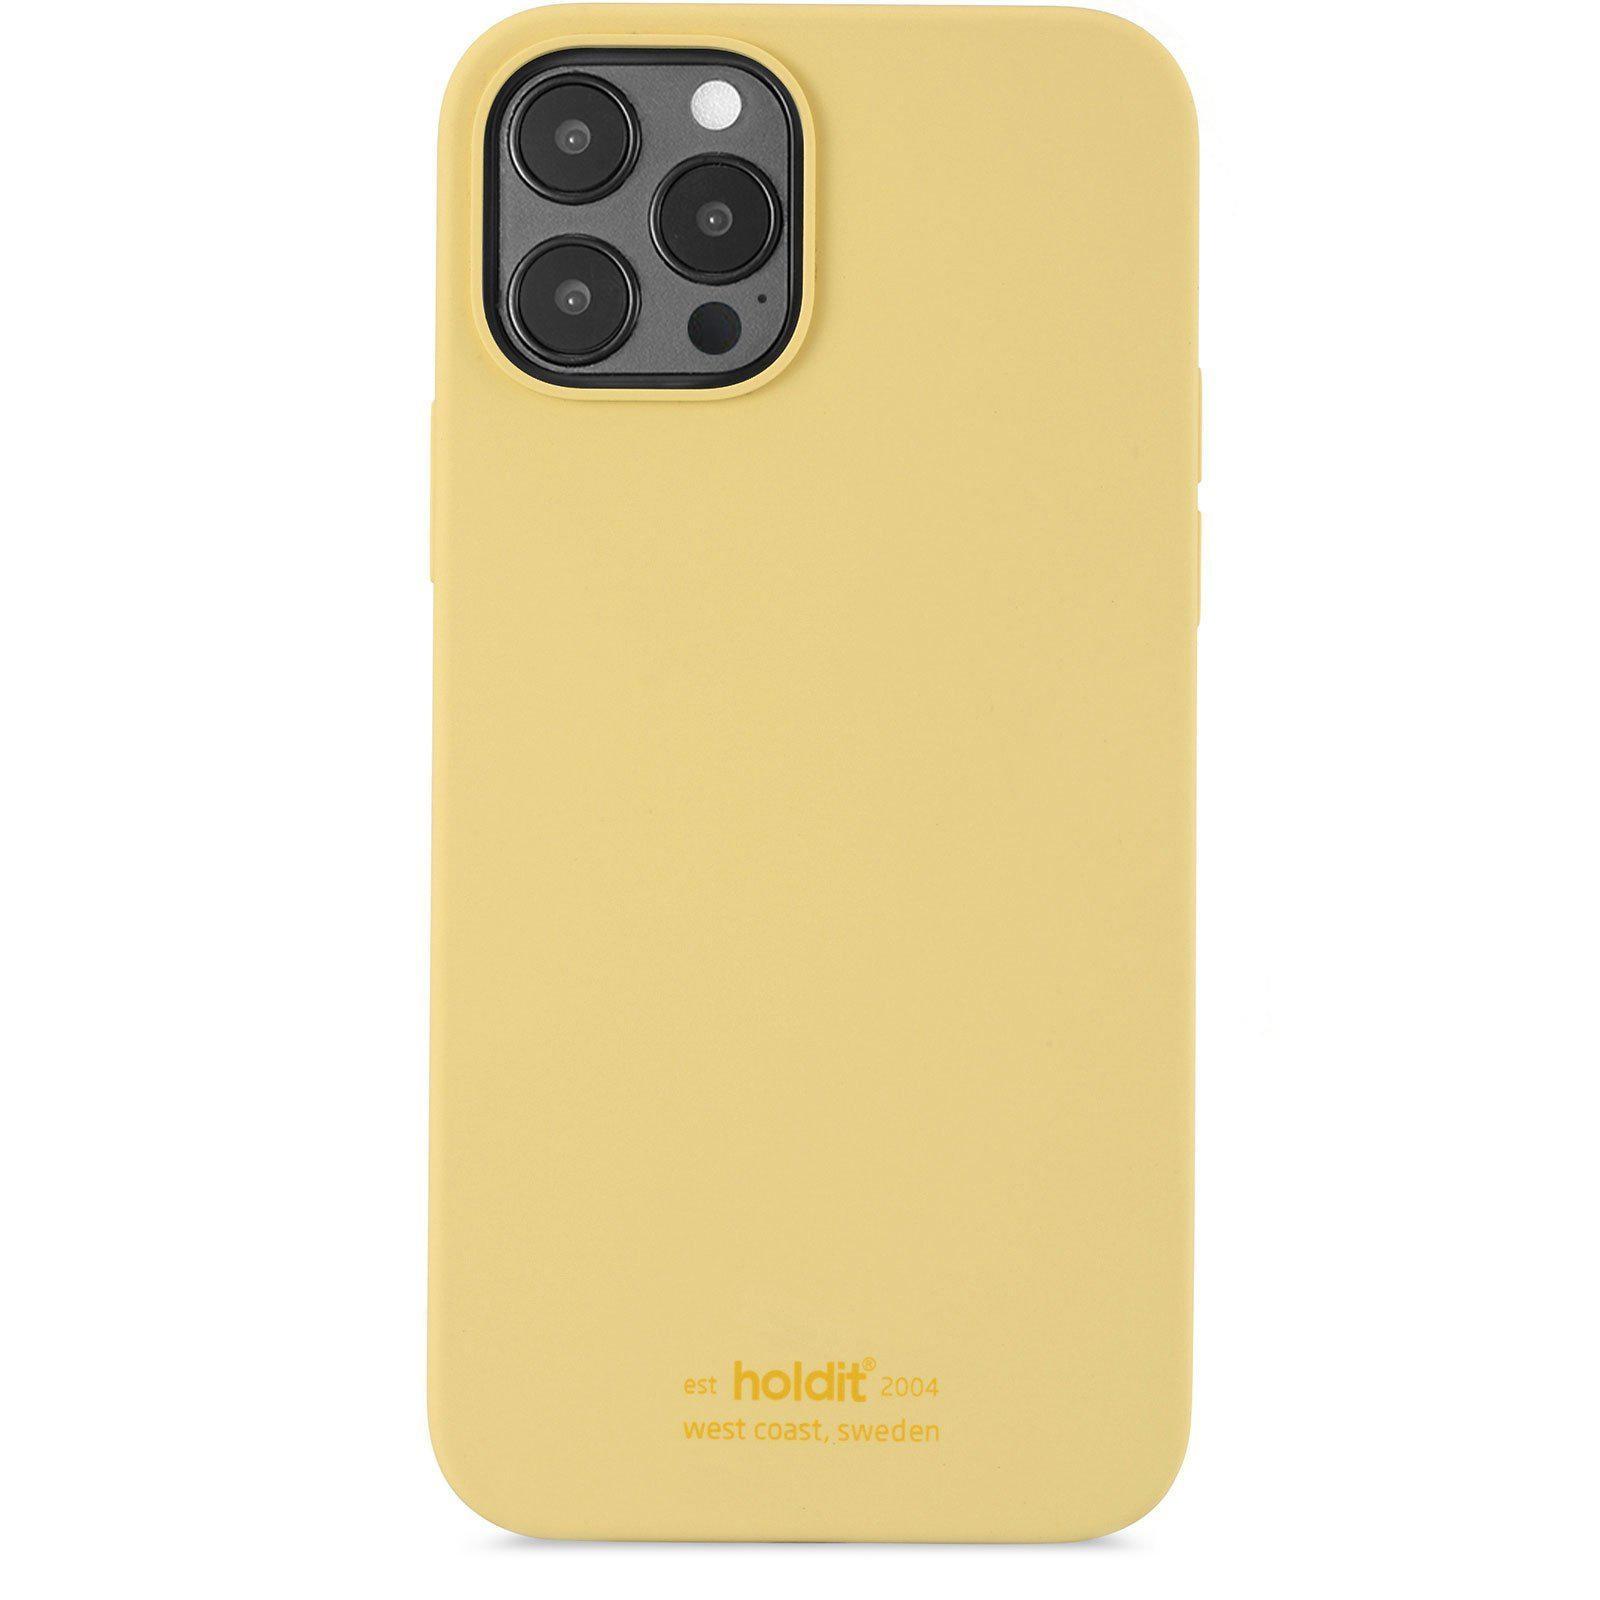 Silikonskal iPhone 12 Pro Max Yellow